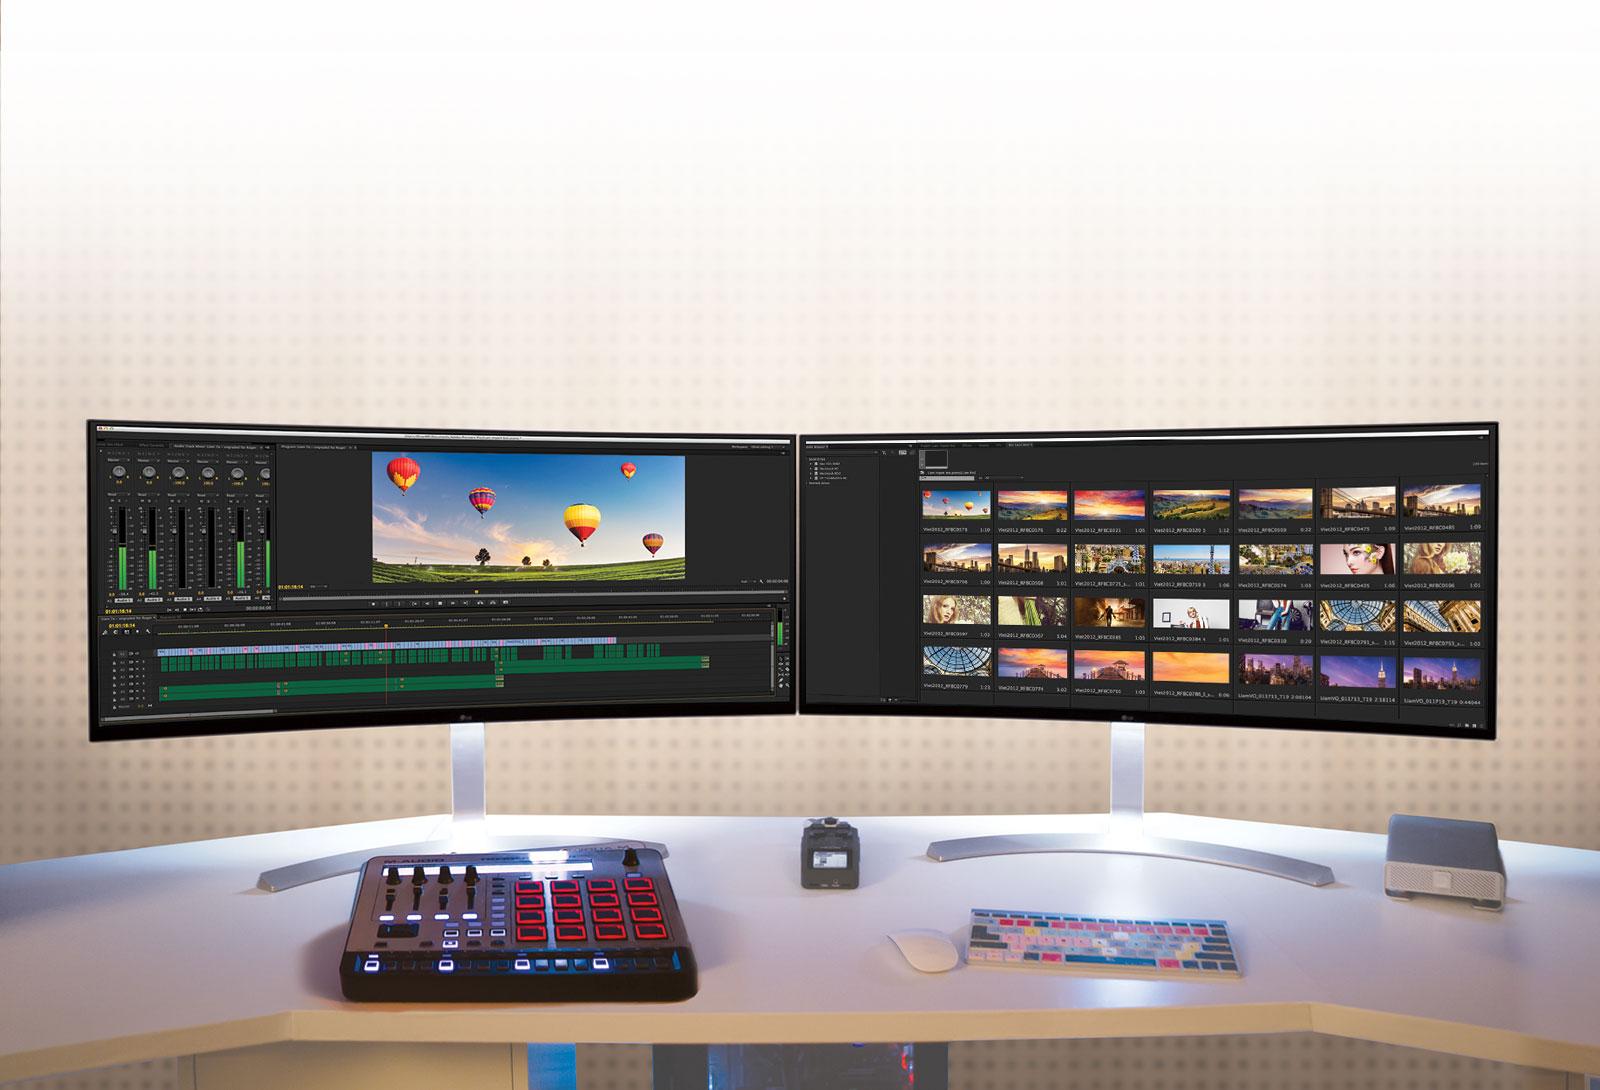 LG 38UC99-W, monitor 21:9 con pantalla IPS